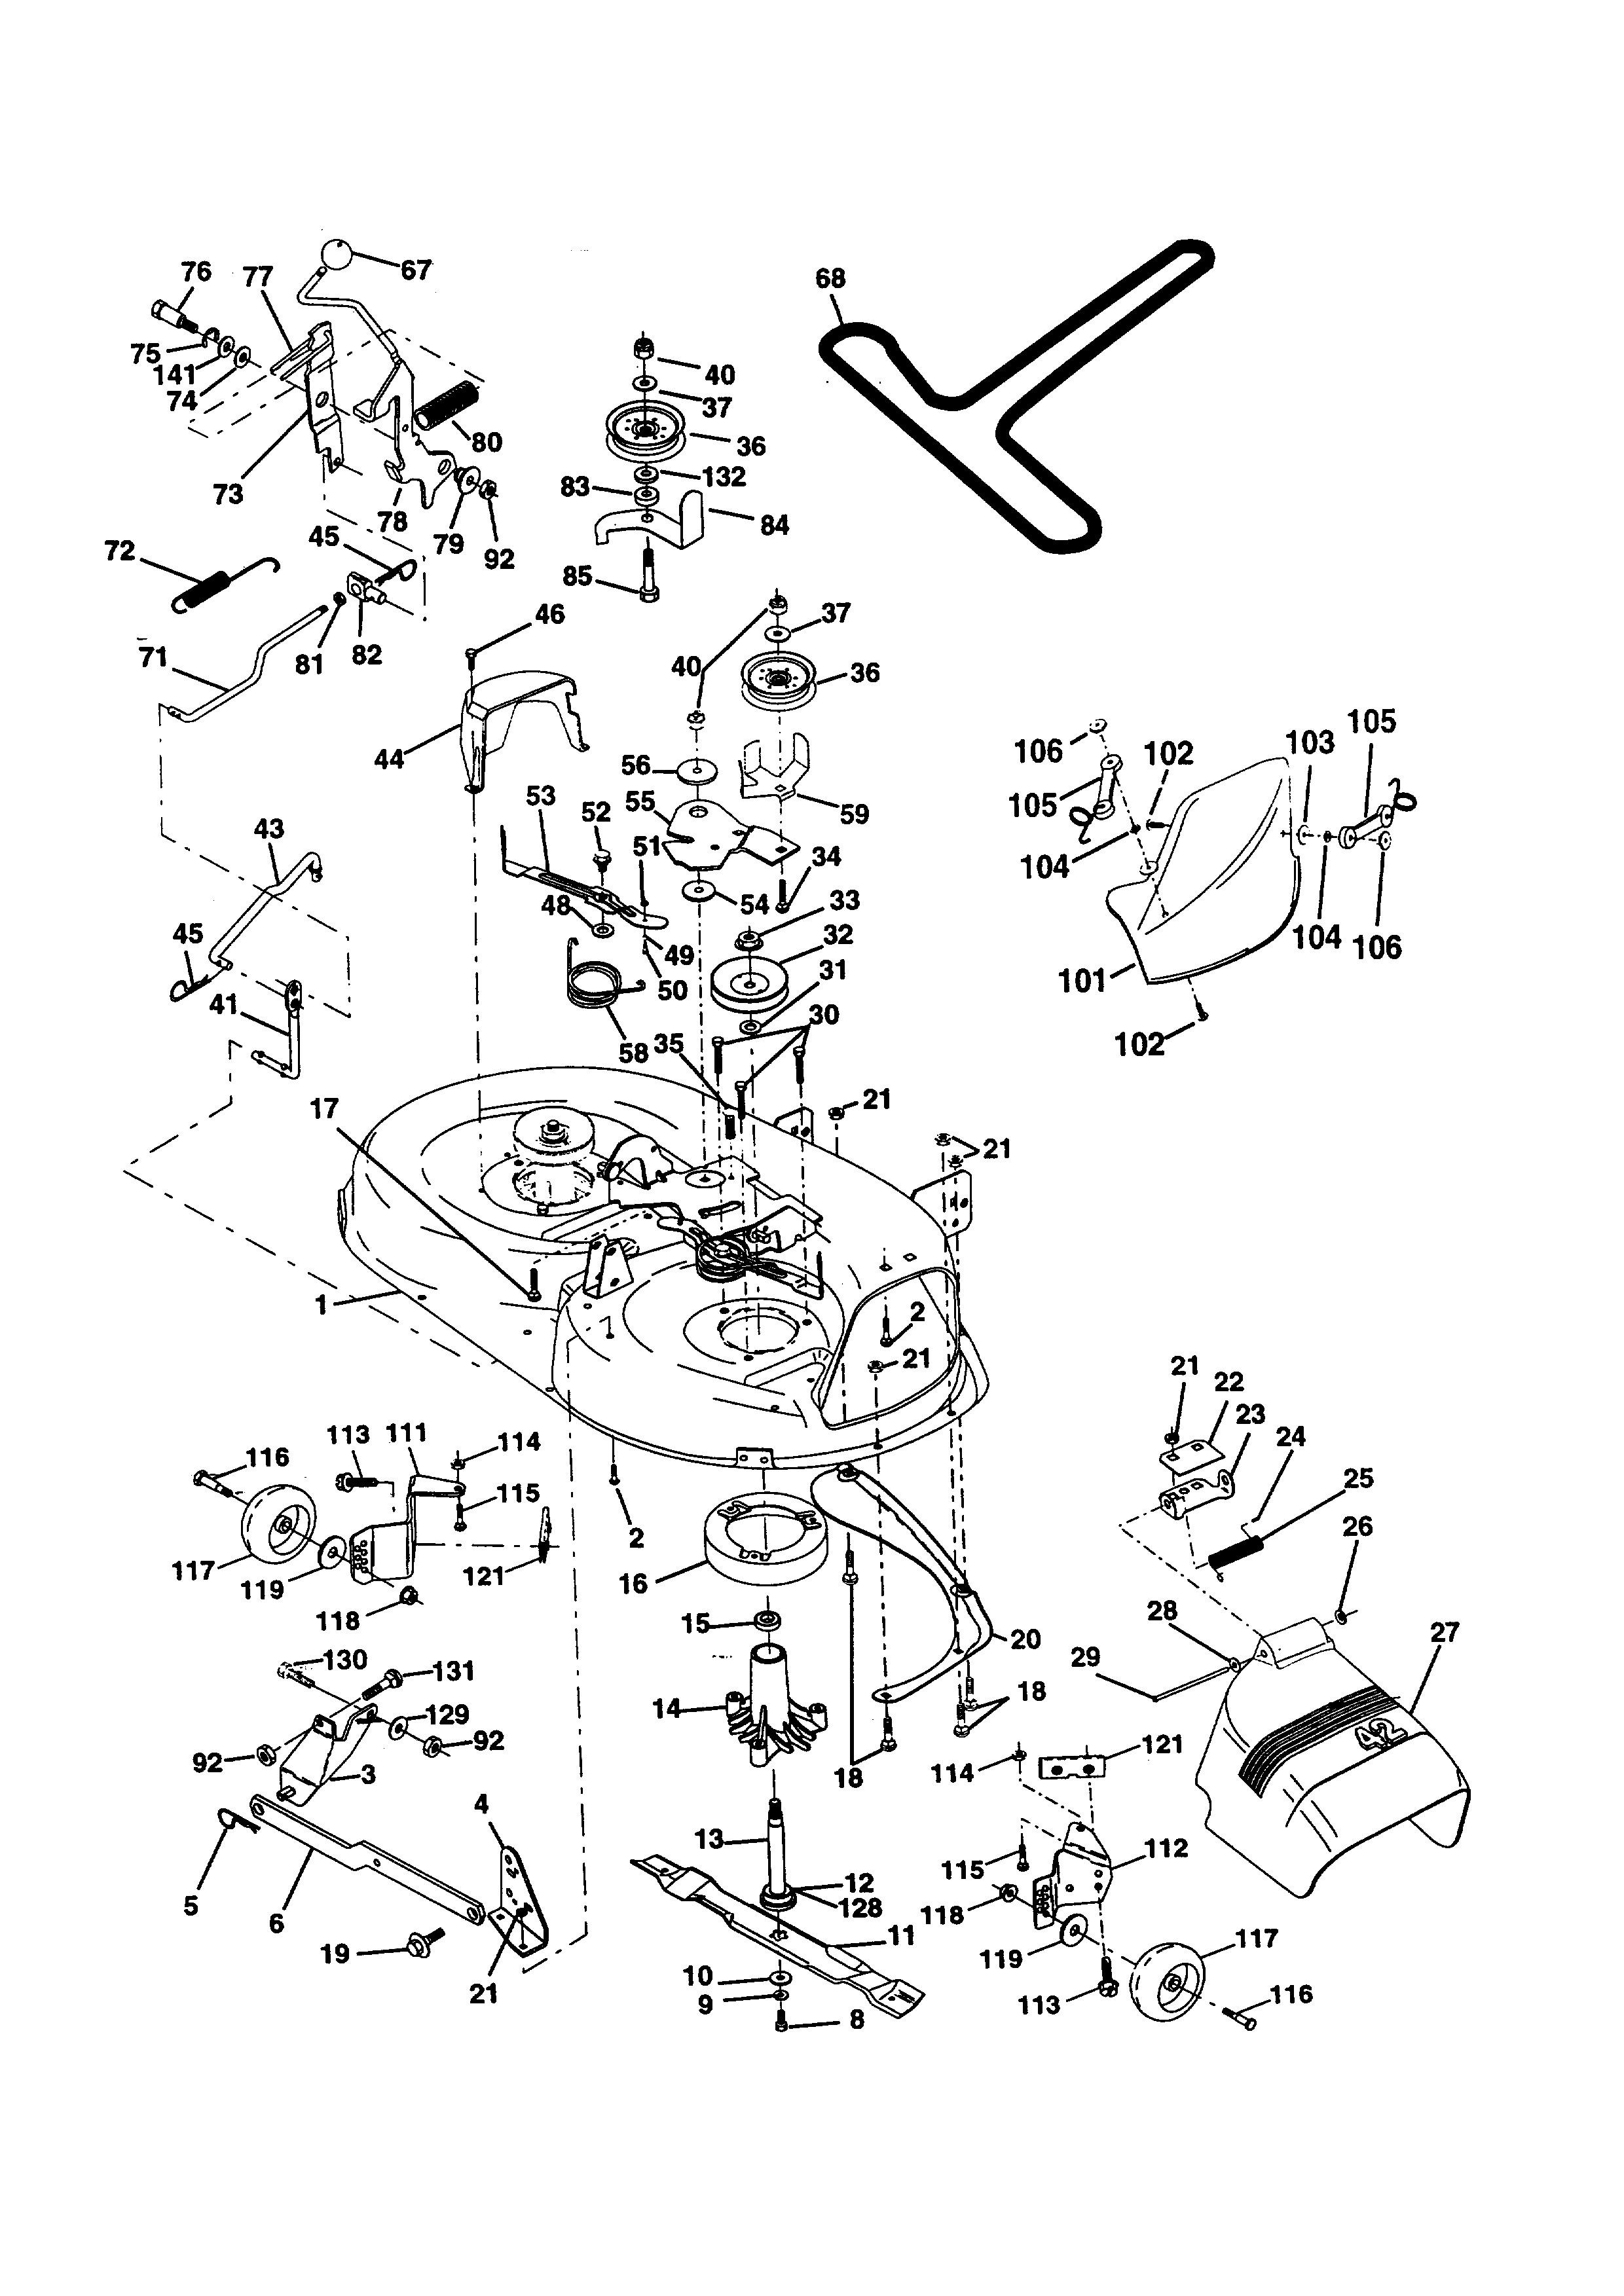 Briggs And Stratton Lawn Mower Engine Parts Diagram My Wiring Western Auto Model Ayp9187b89 Tractor Genuine